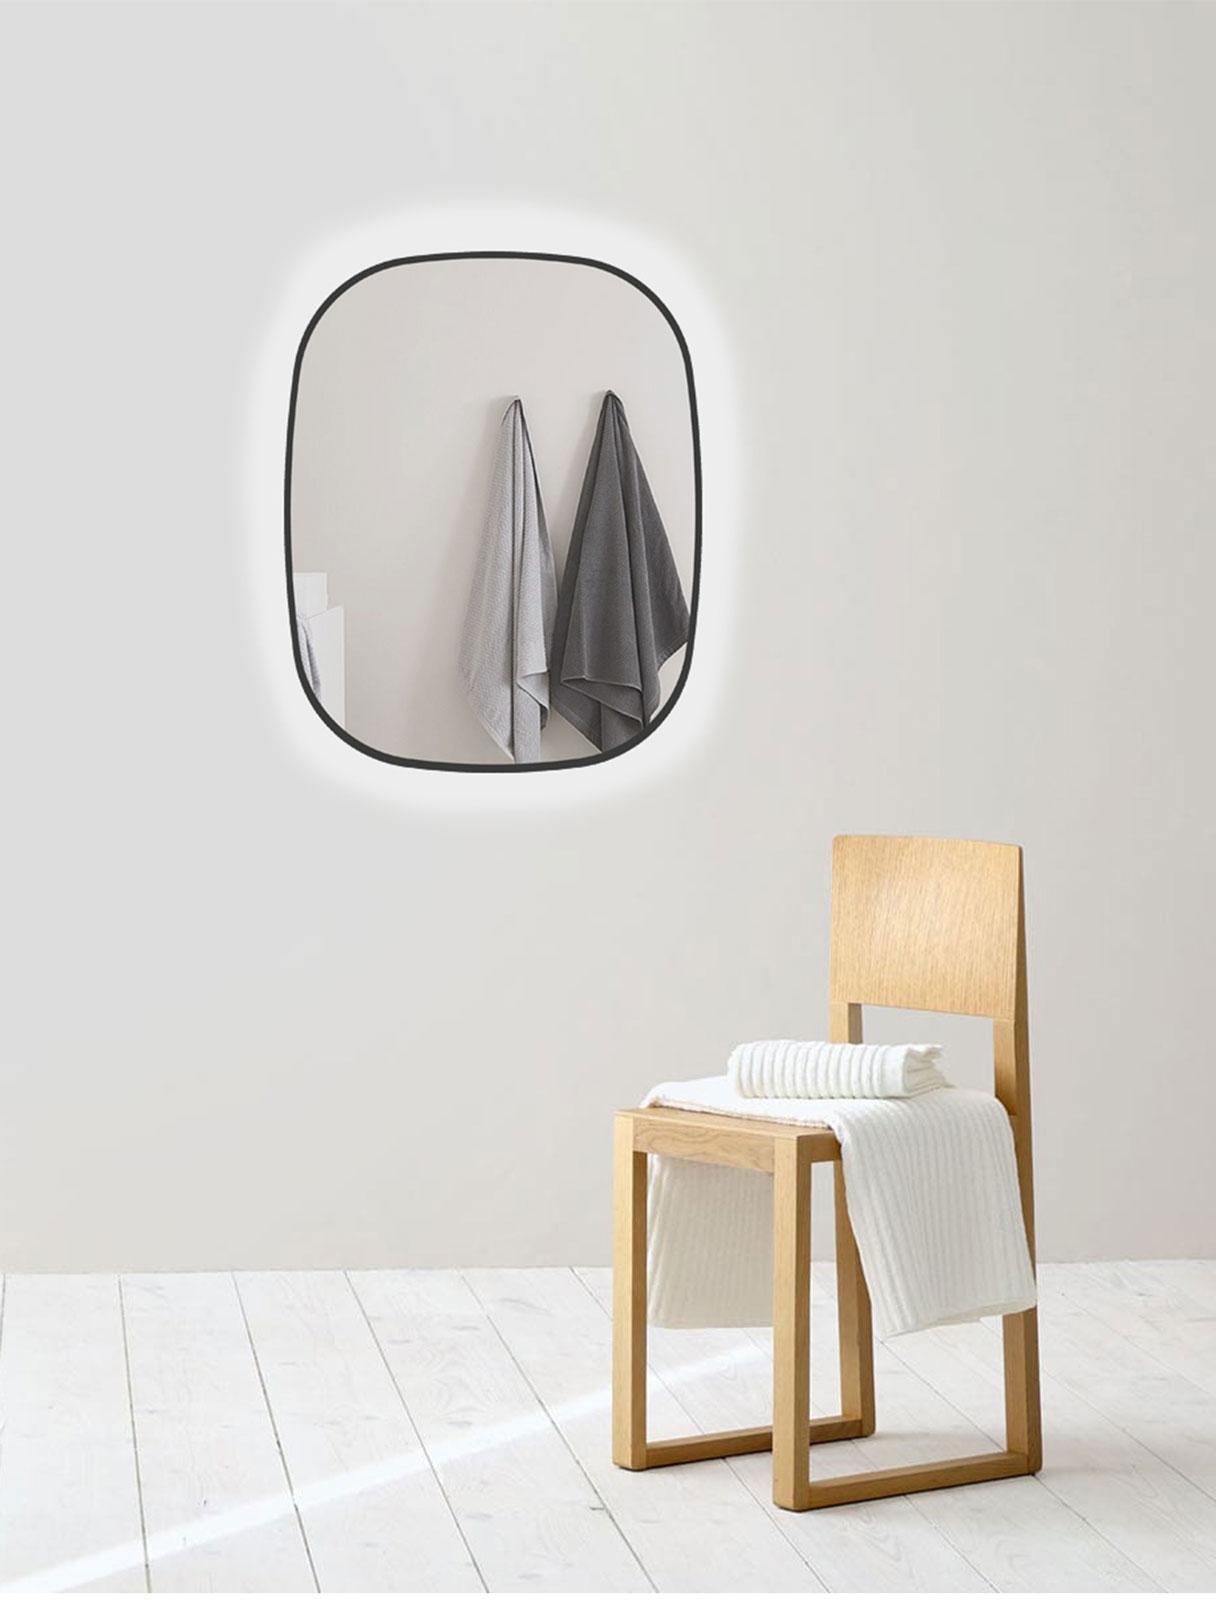 led-zrkadlo-sand-60x70cm-LNR3475-dizajnova-3